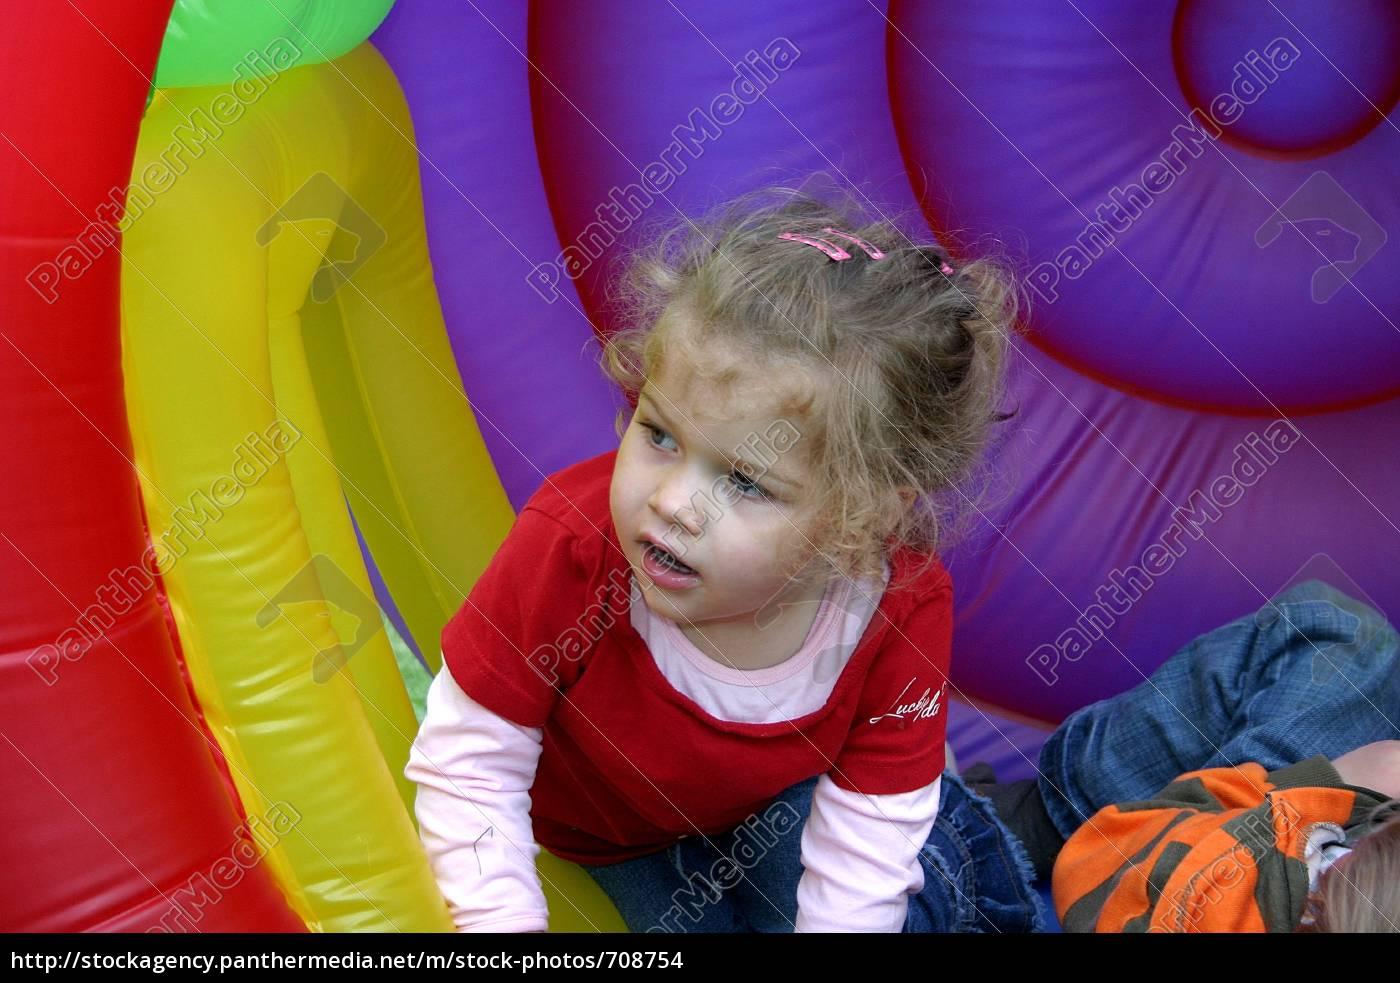 children, playing, 06 - 708754